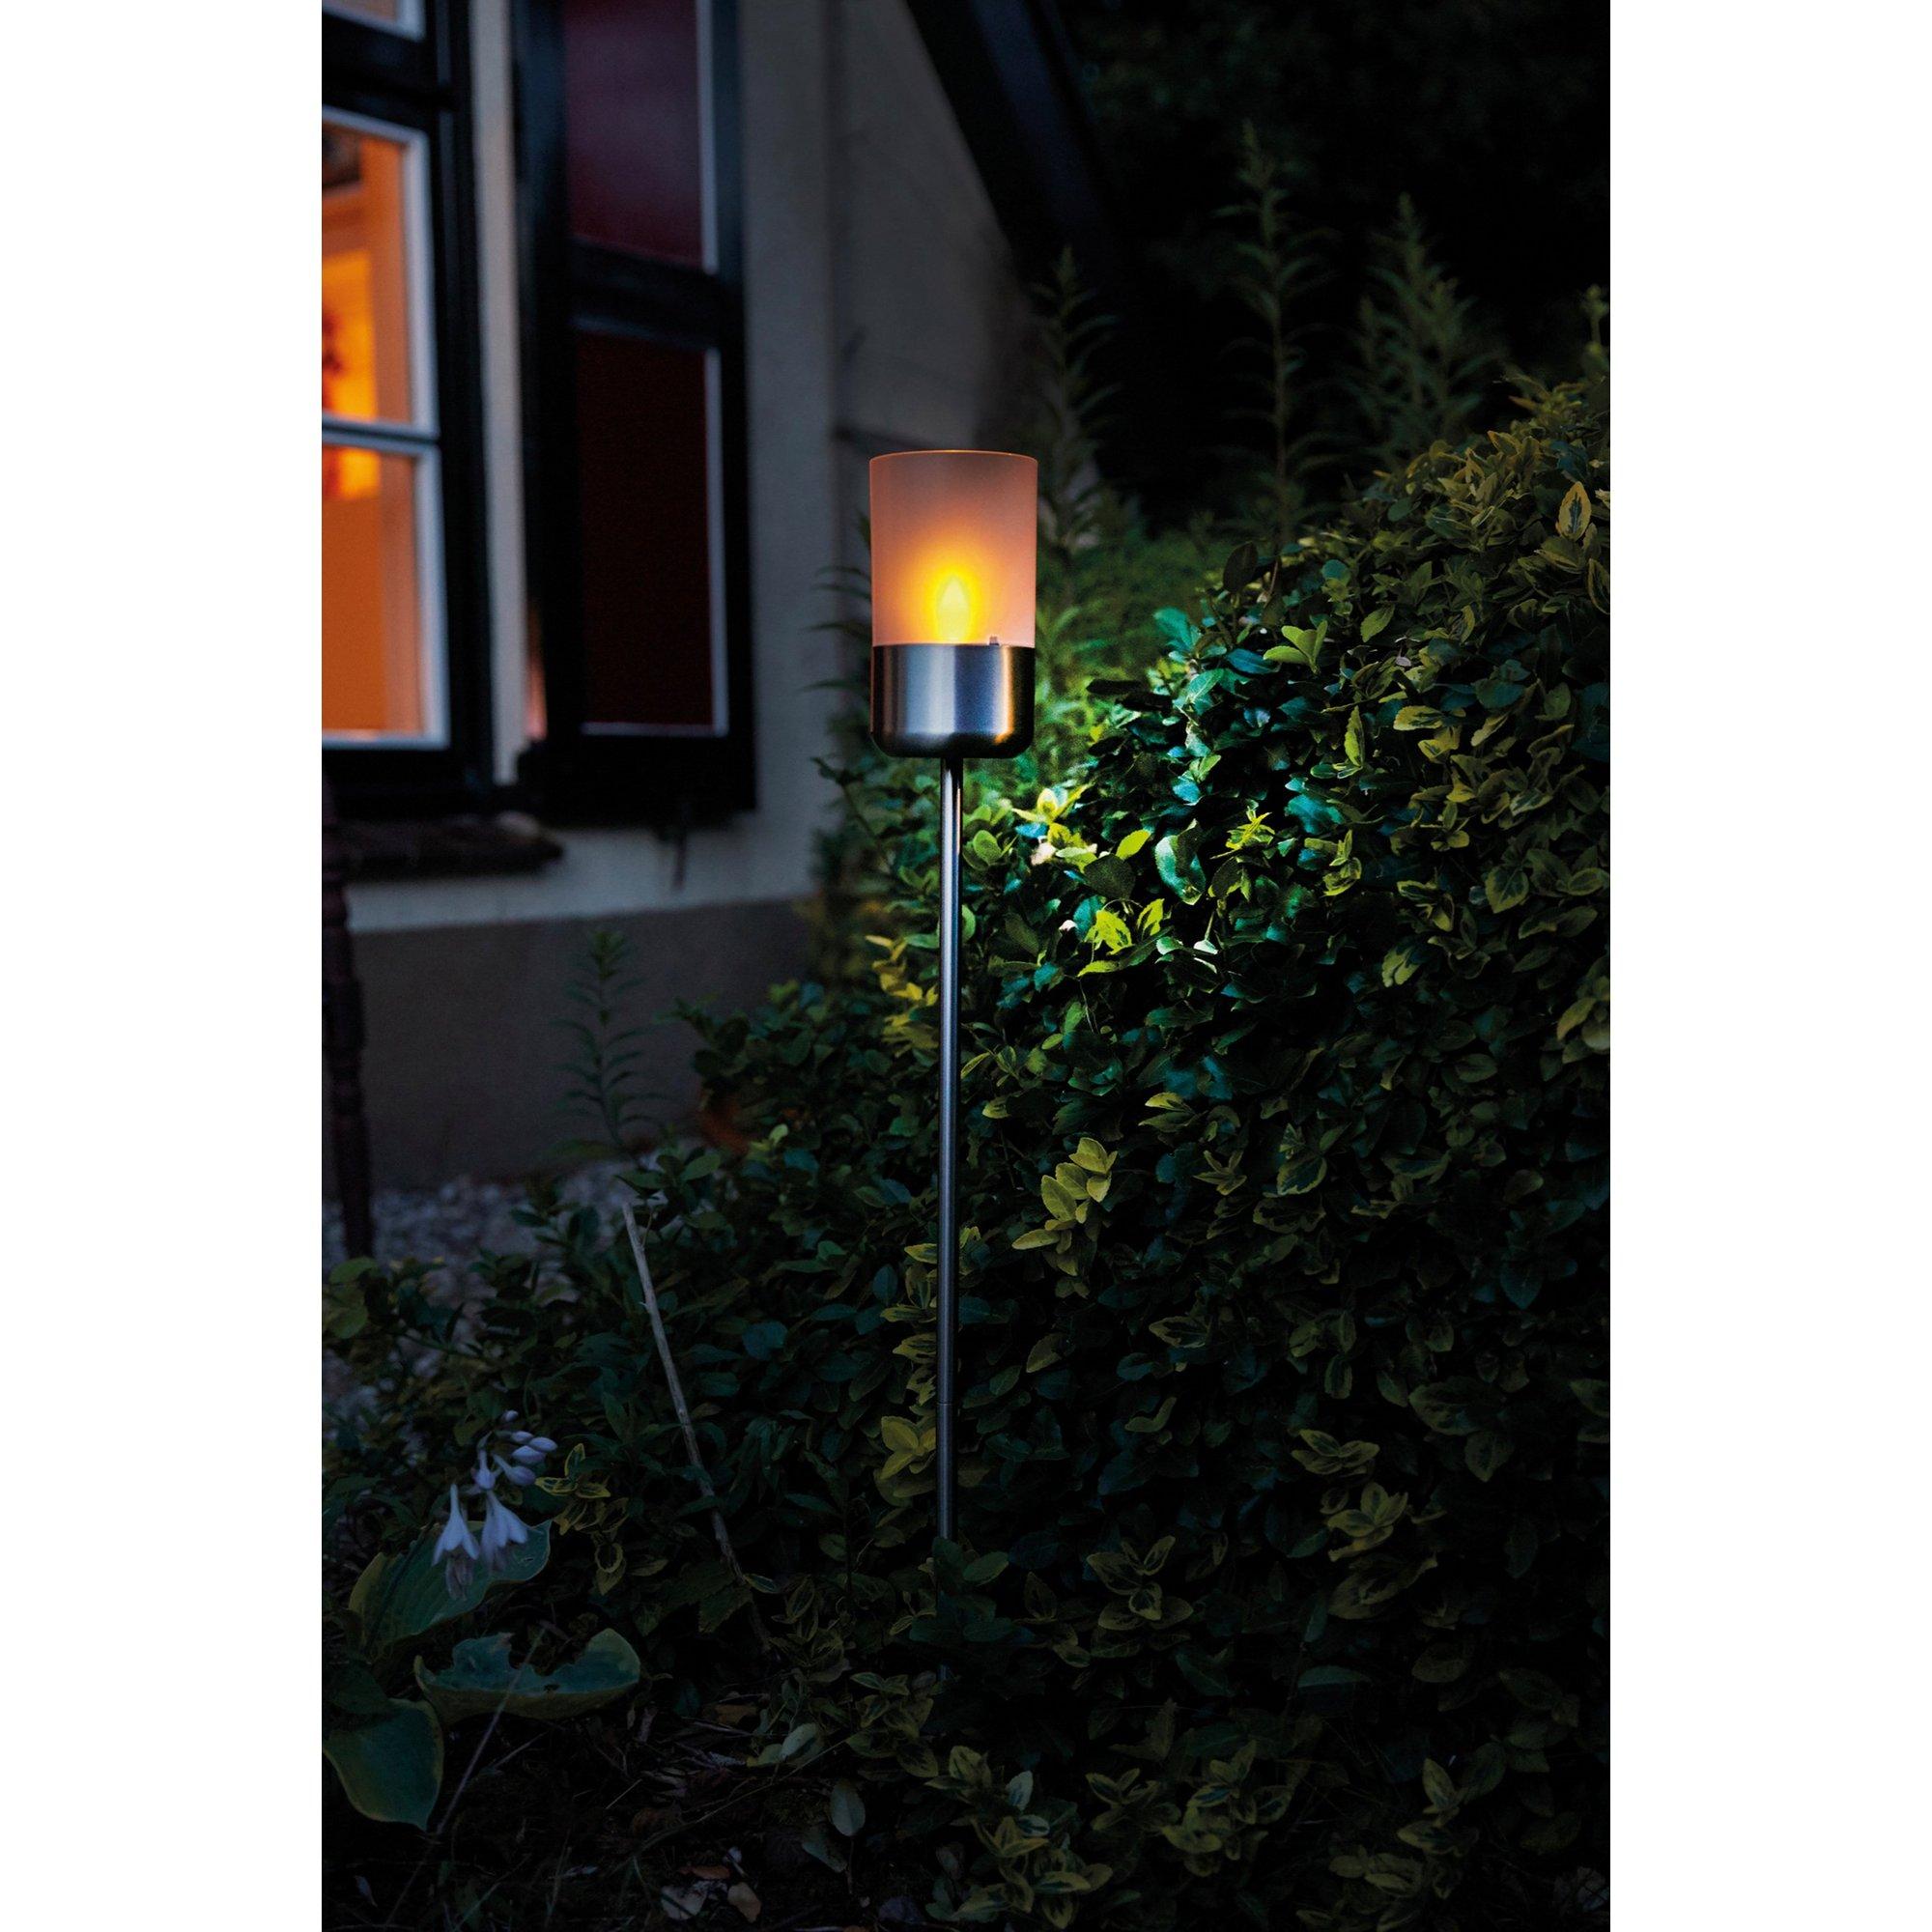 Image of Jamaica Solar Garden Spike Light in Stainless Steel